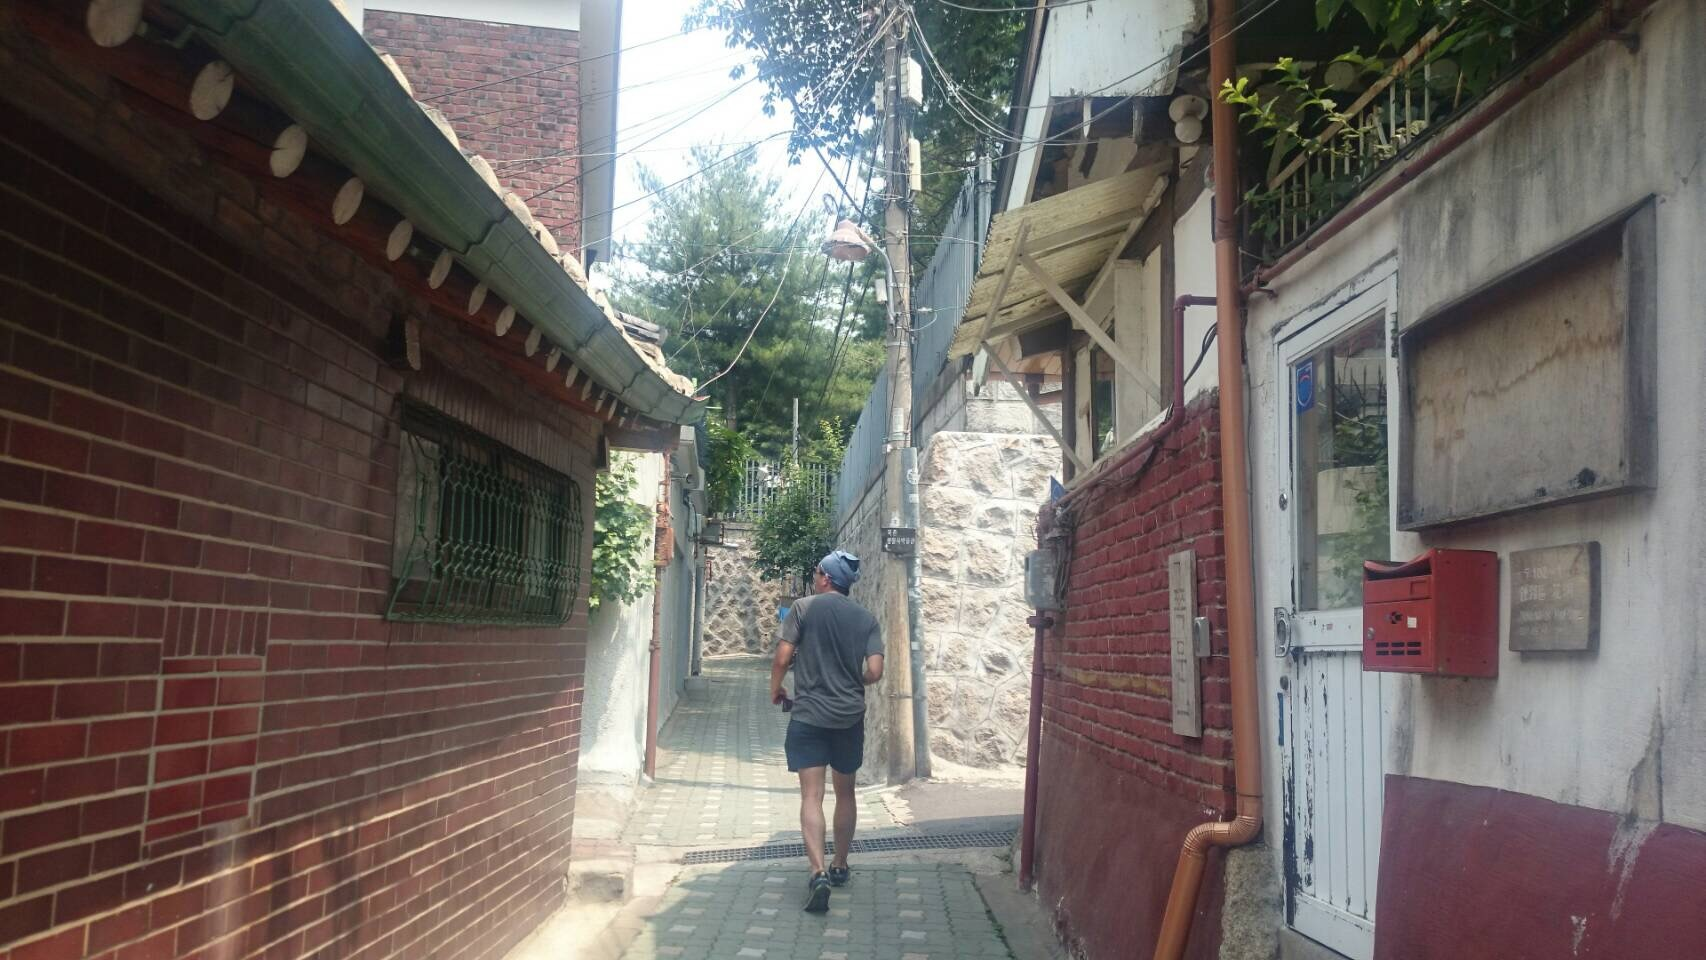 2016.6.16-19 SEOUL TRIP ~食べて呑んで走るソウルの旅~ day3-4_b0219778_22350460.jpg